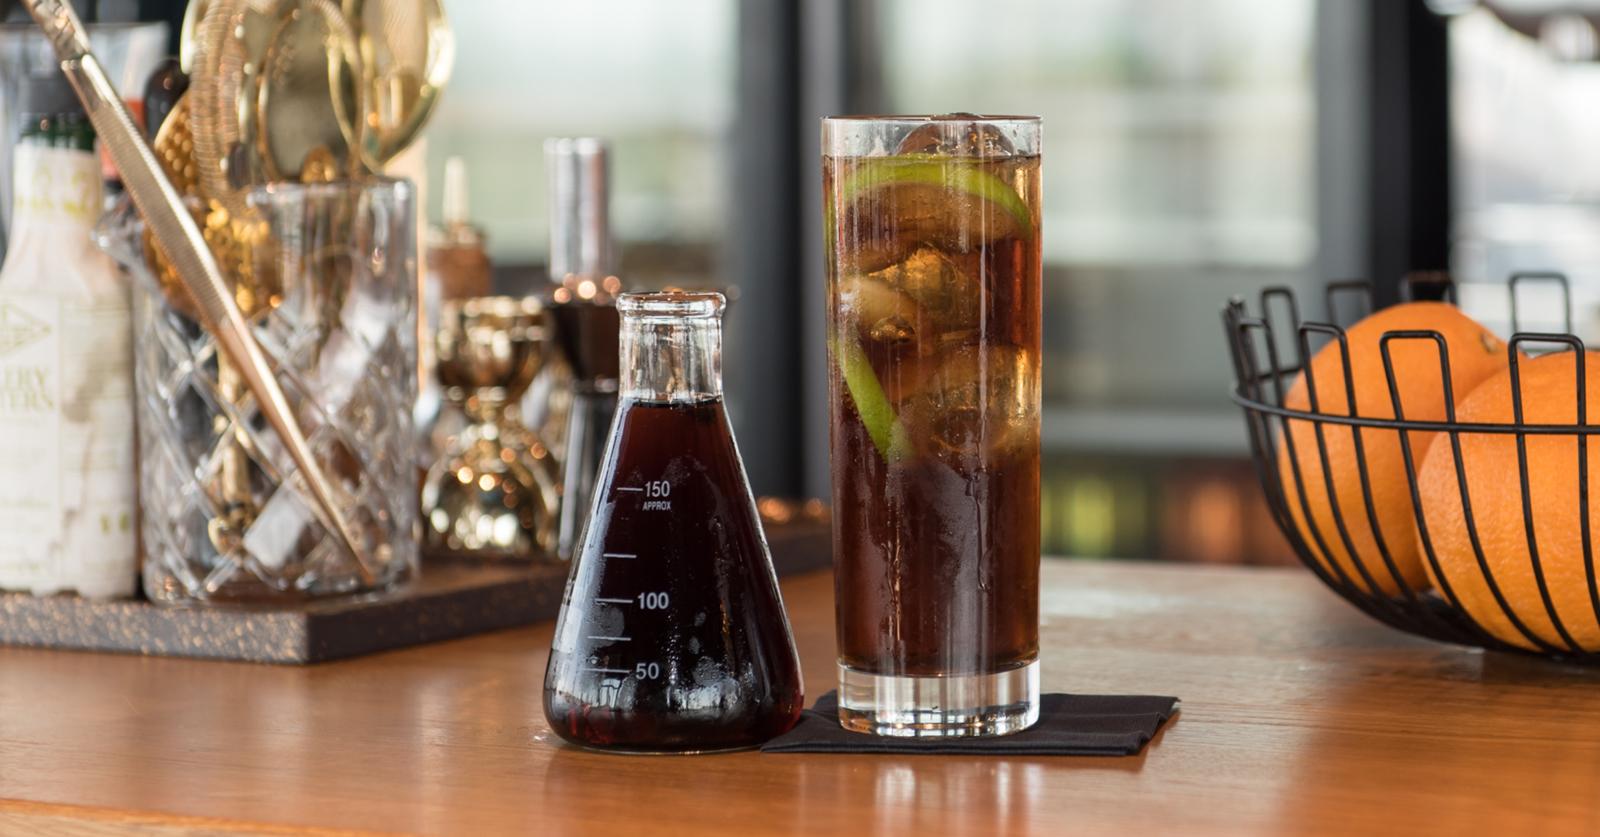 Rommikola Chicago-lasissa ja coca-cola Libbey:n Erlenmeyerpullossa.